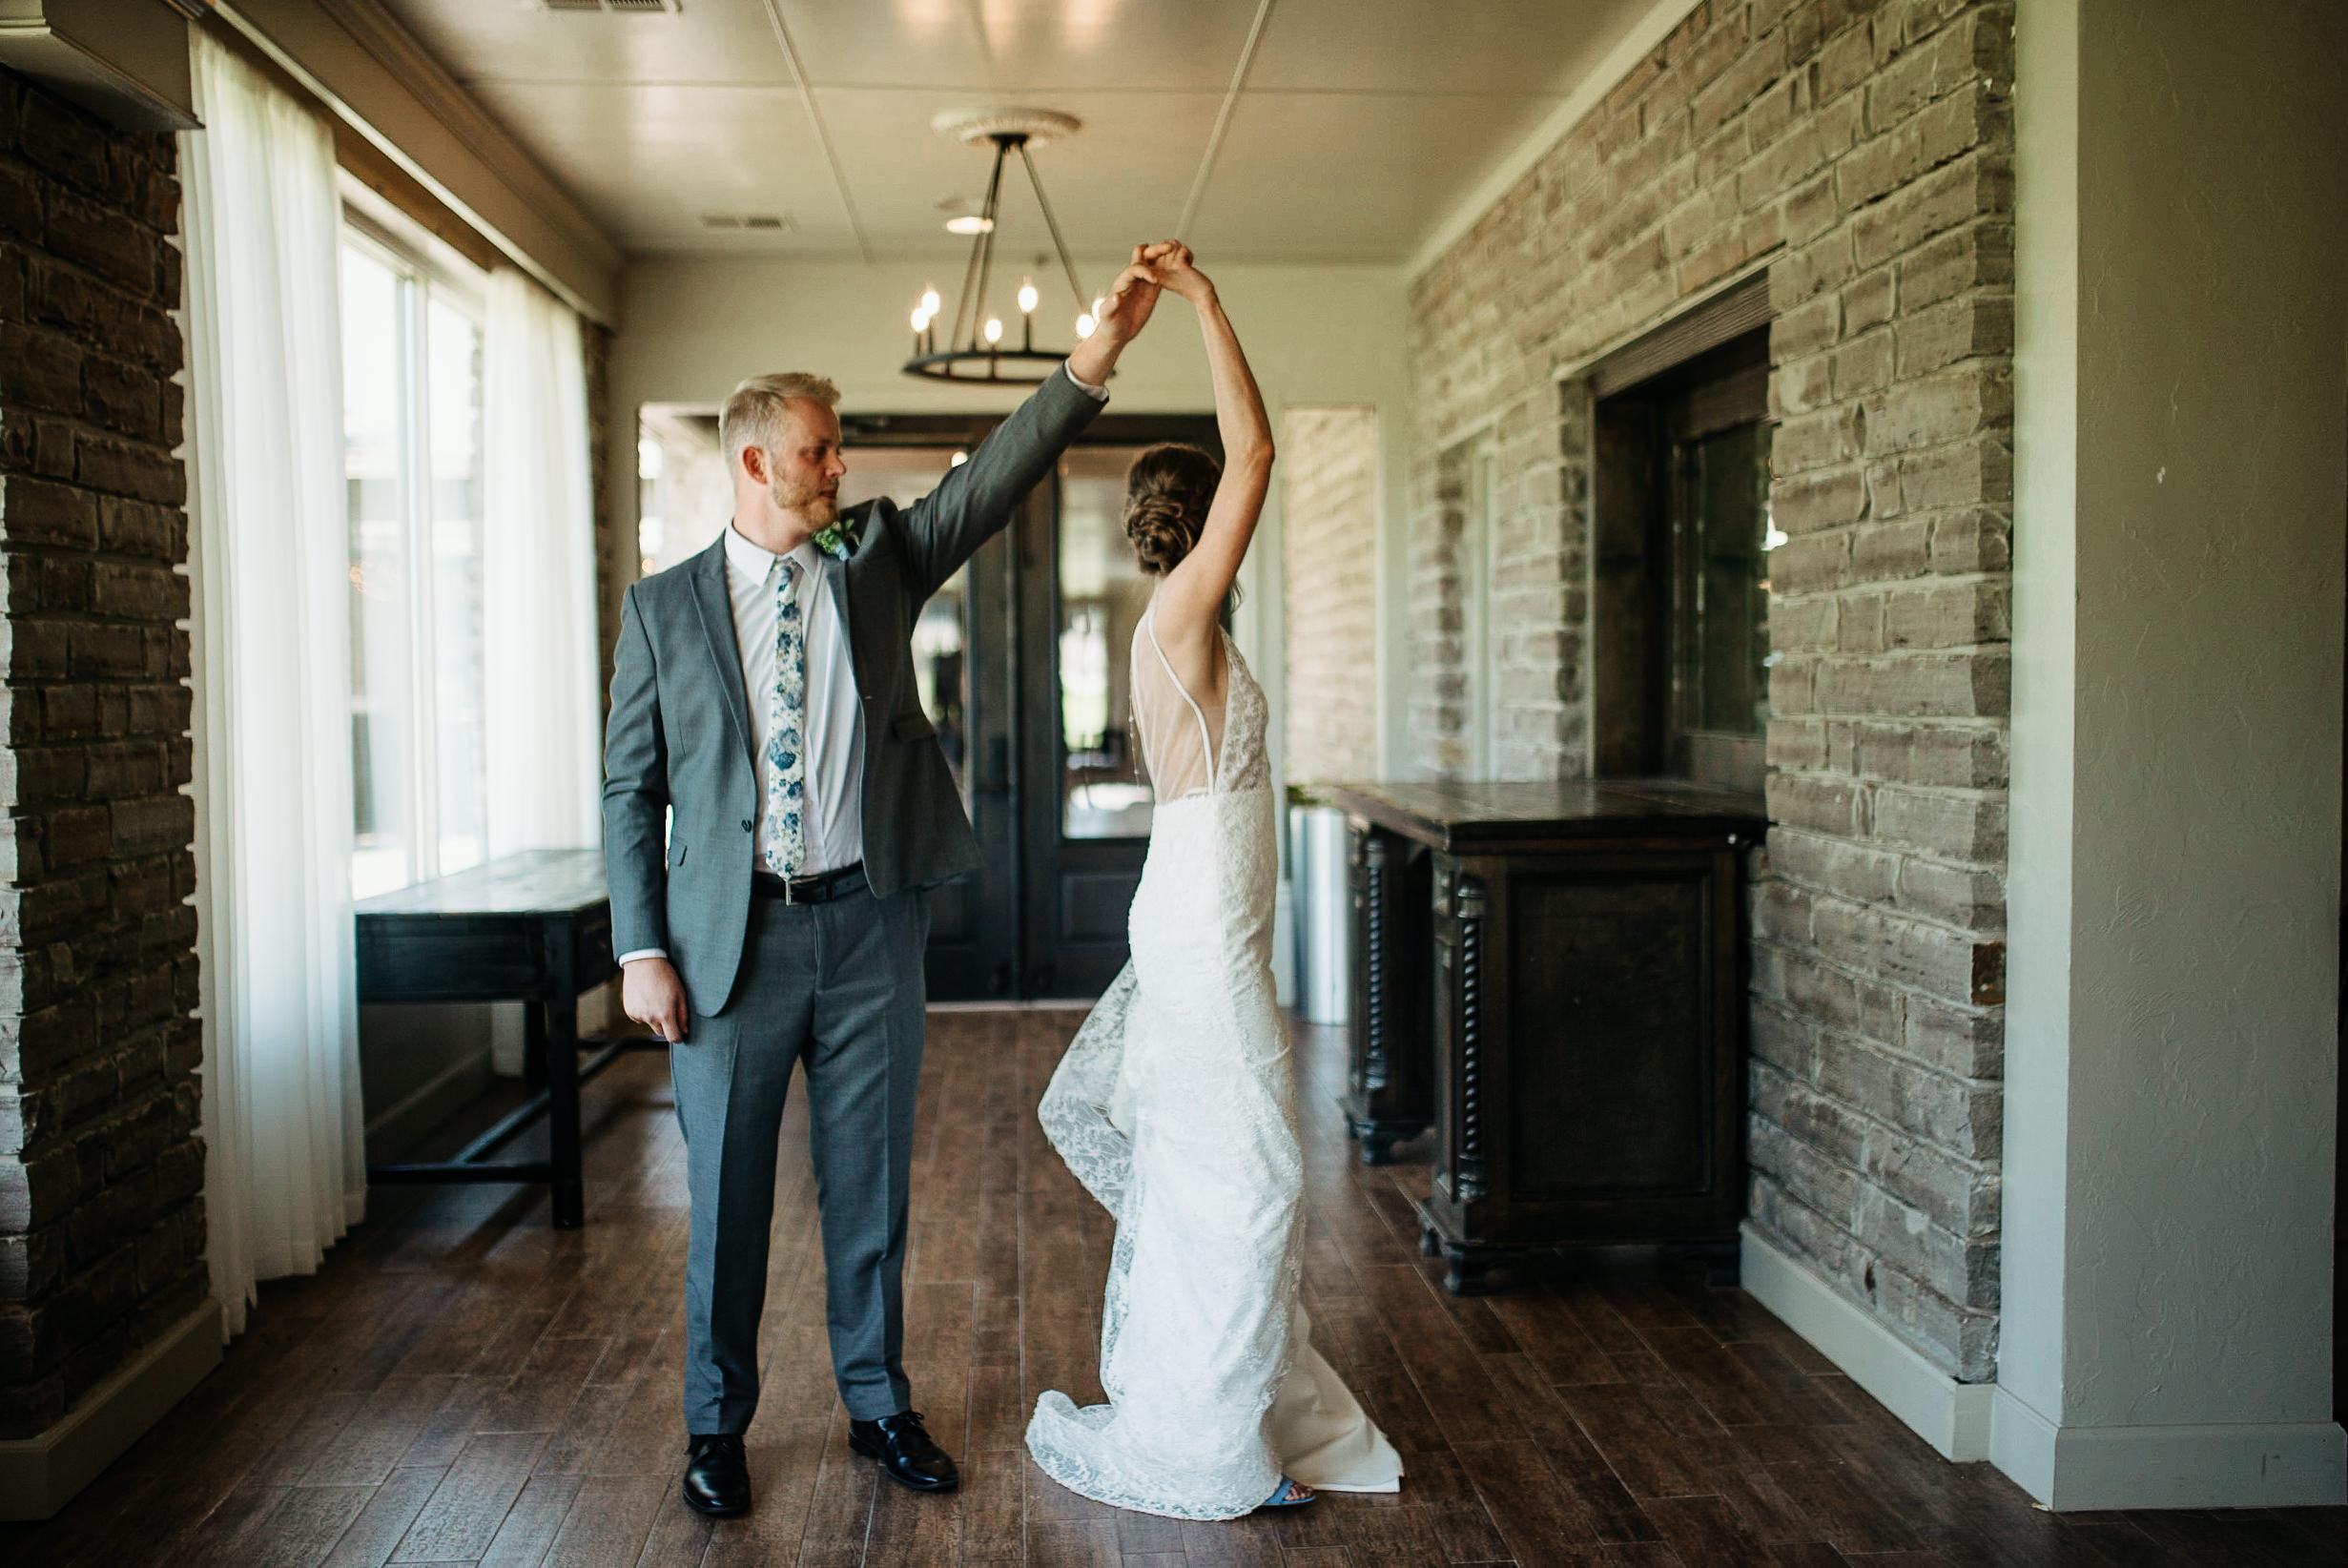 okc-wedding-photographer-coles-garden-wedding-okc-best-wedding-photographers-92.jpg